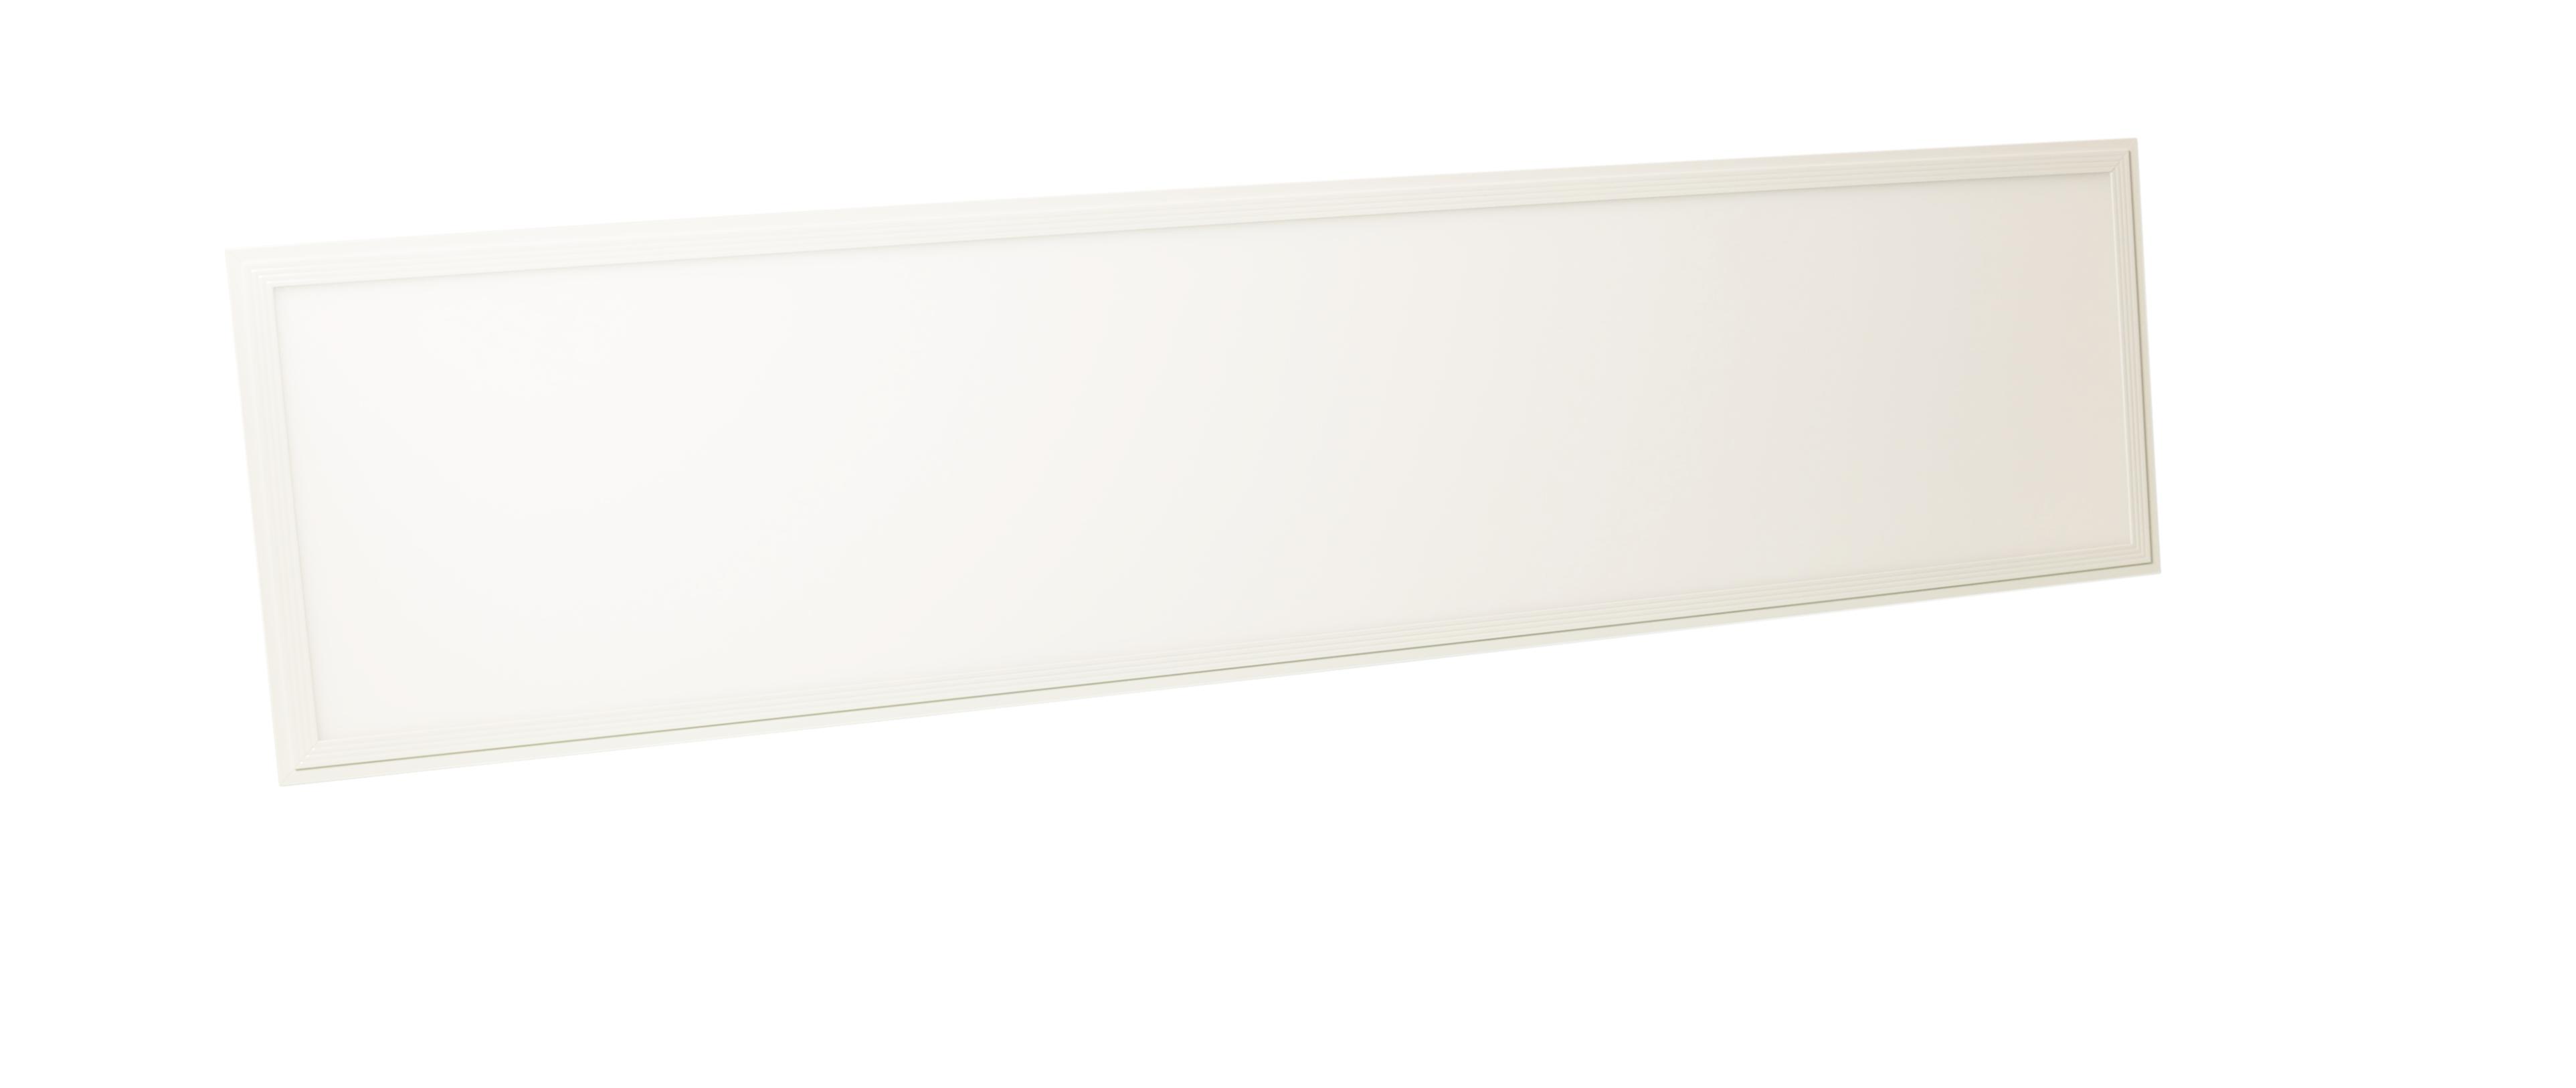 LED LIGHT PANEL - 36W - 1200mm X 300mm - 5000K